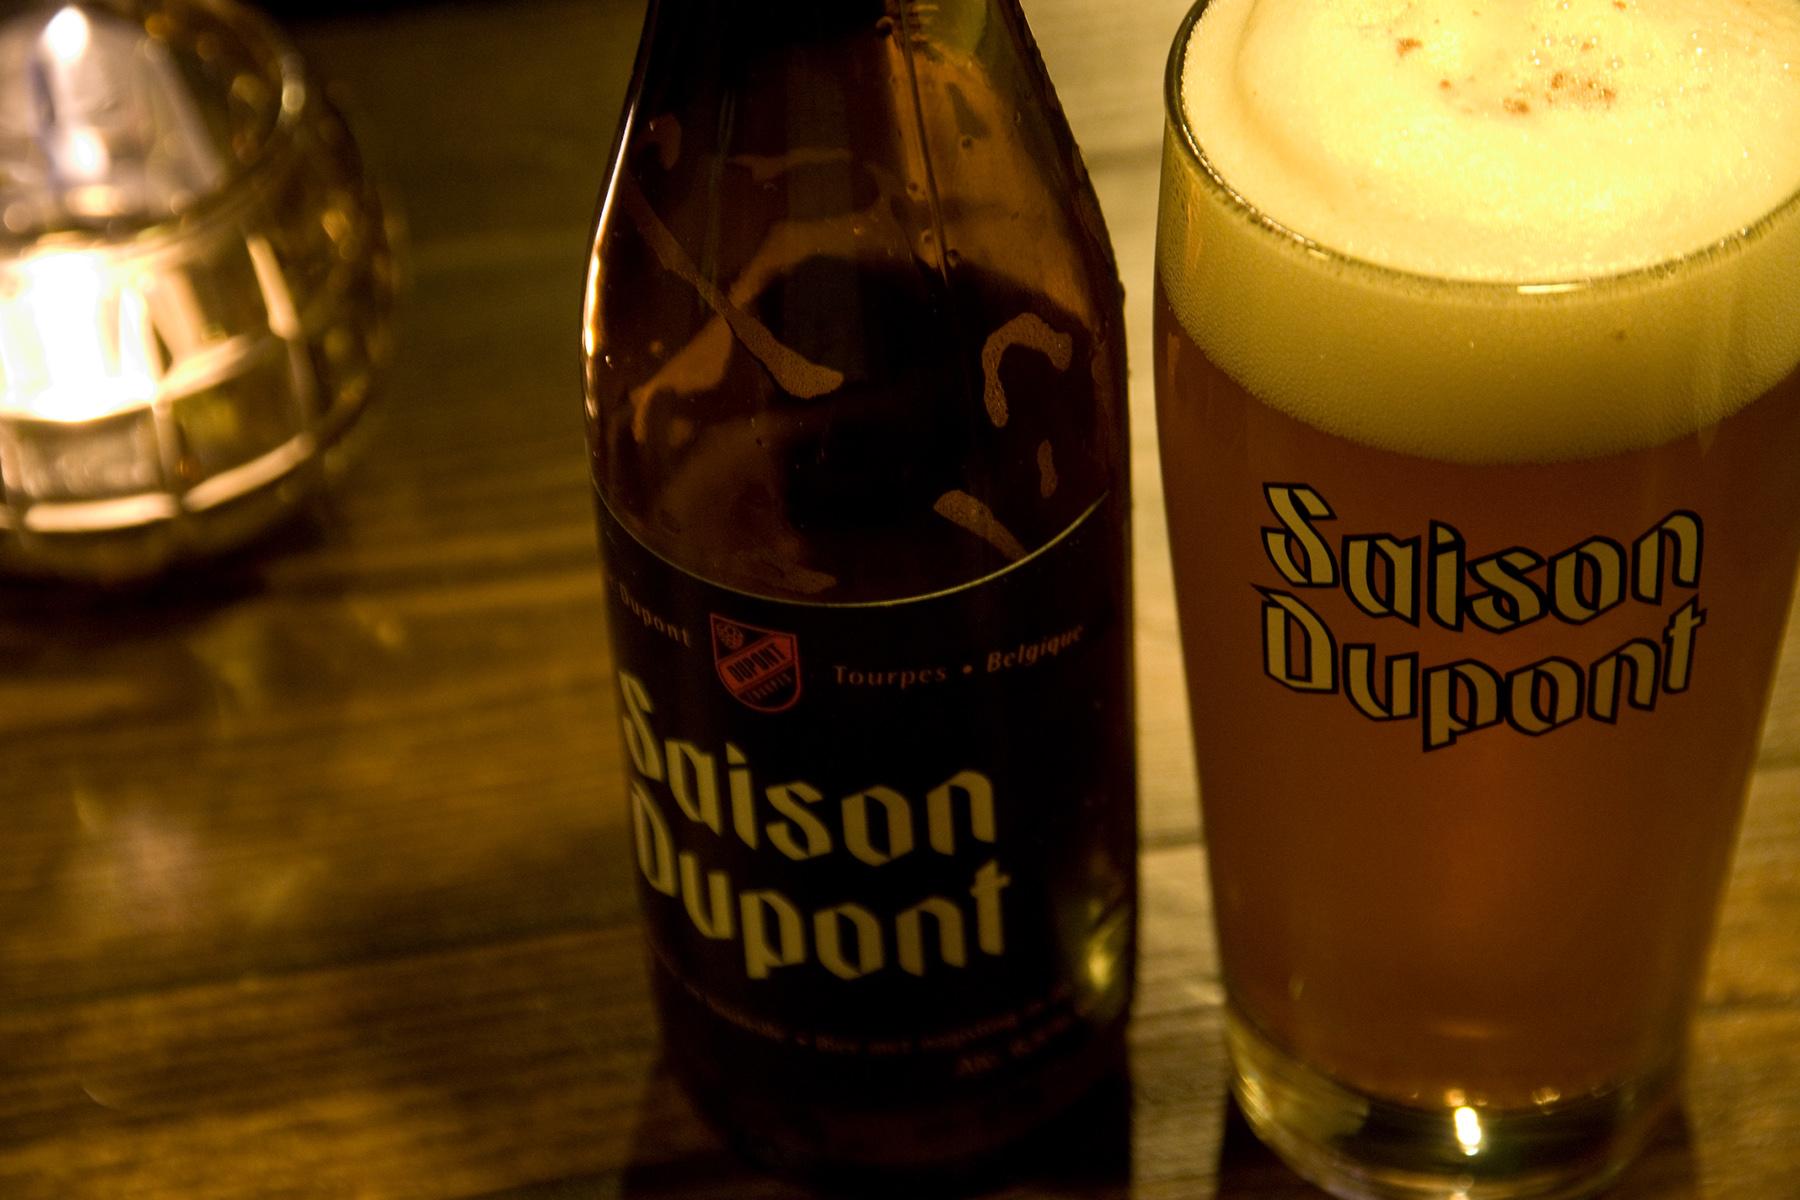 Saison Dupont (Photo: [cipher] / Flickr)